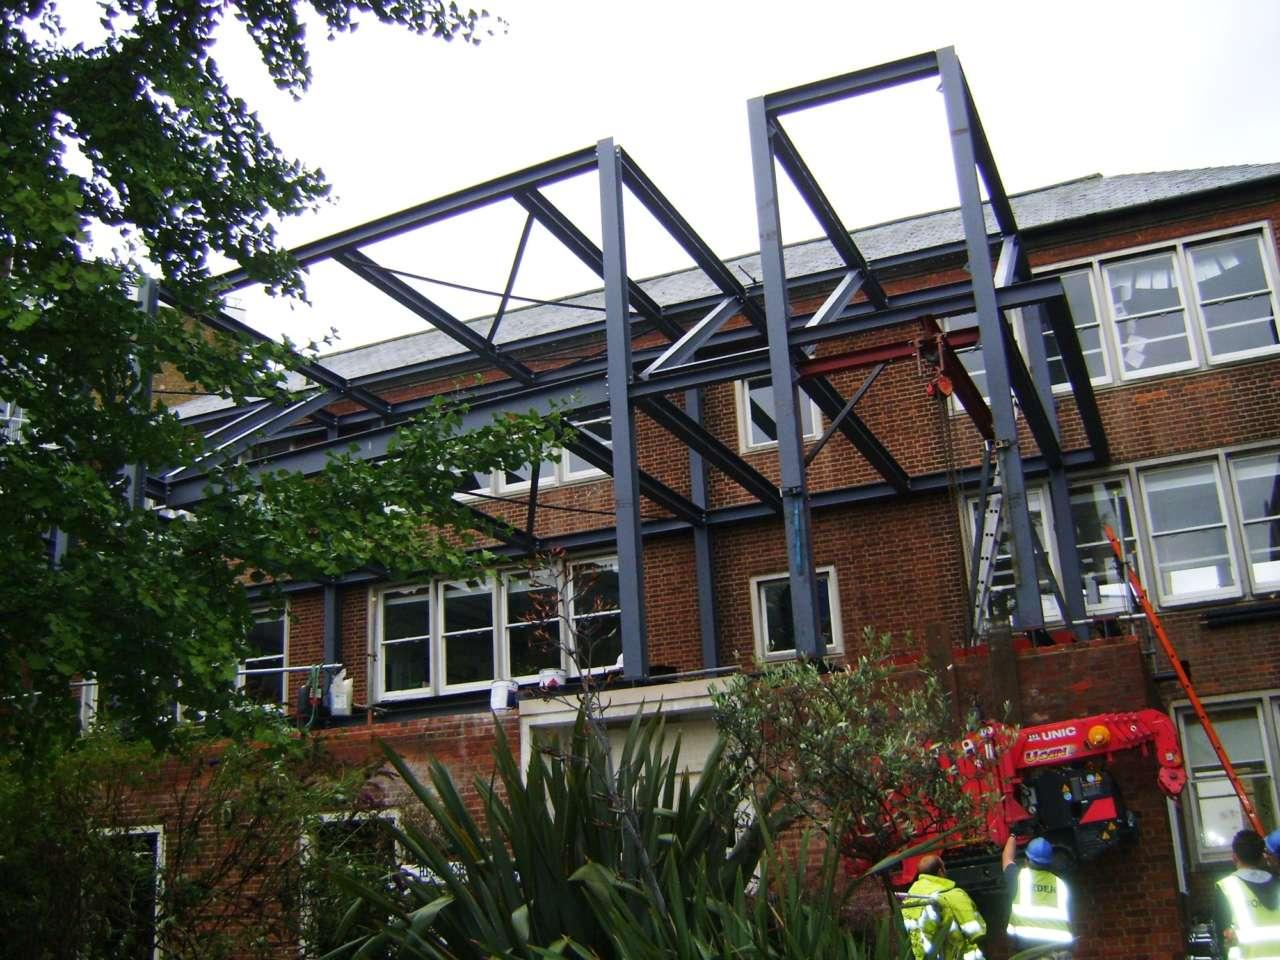 Thomas's School, London